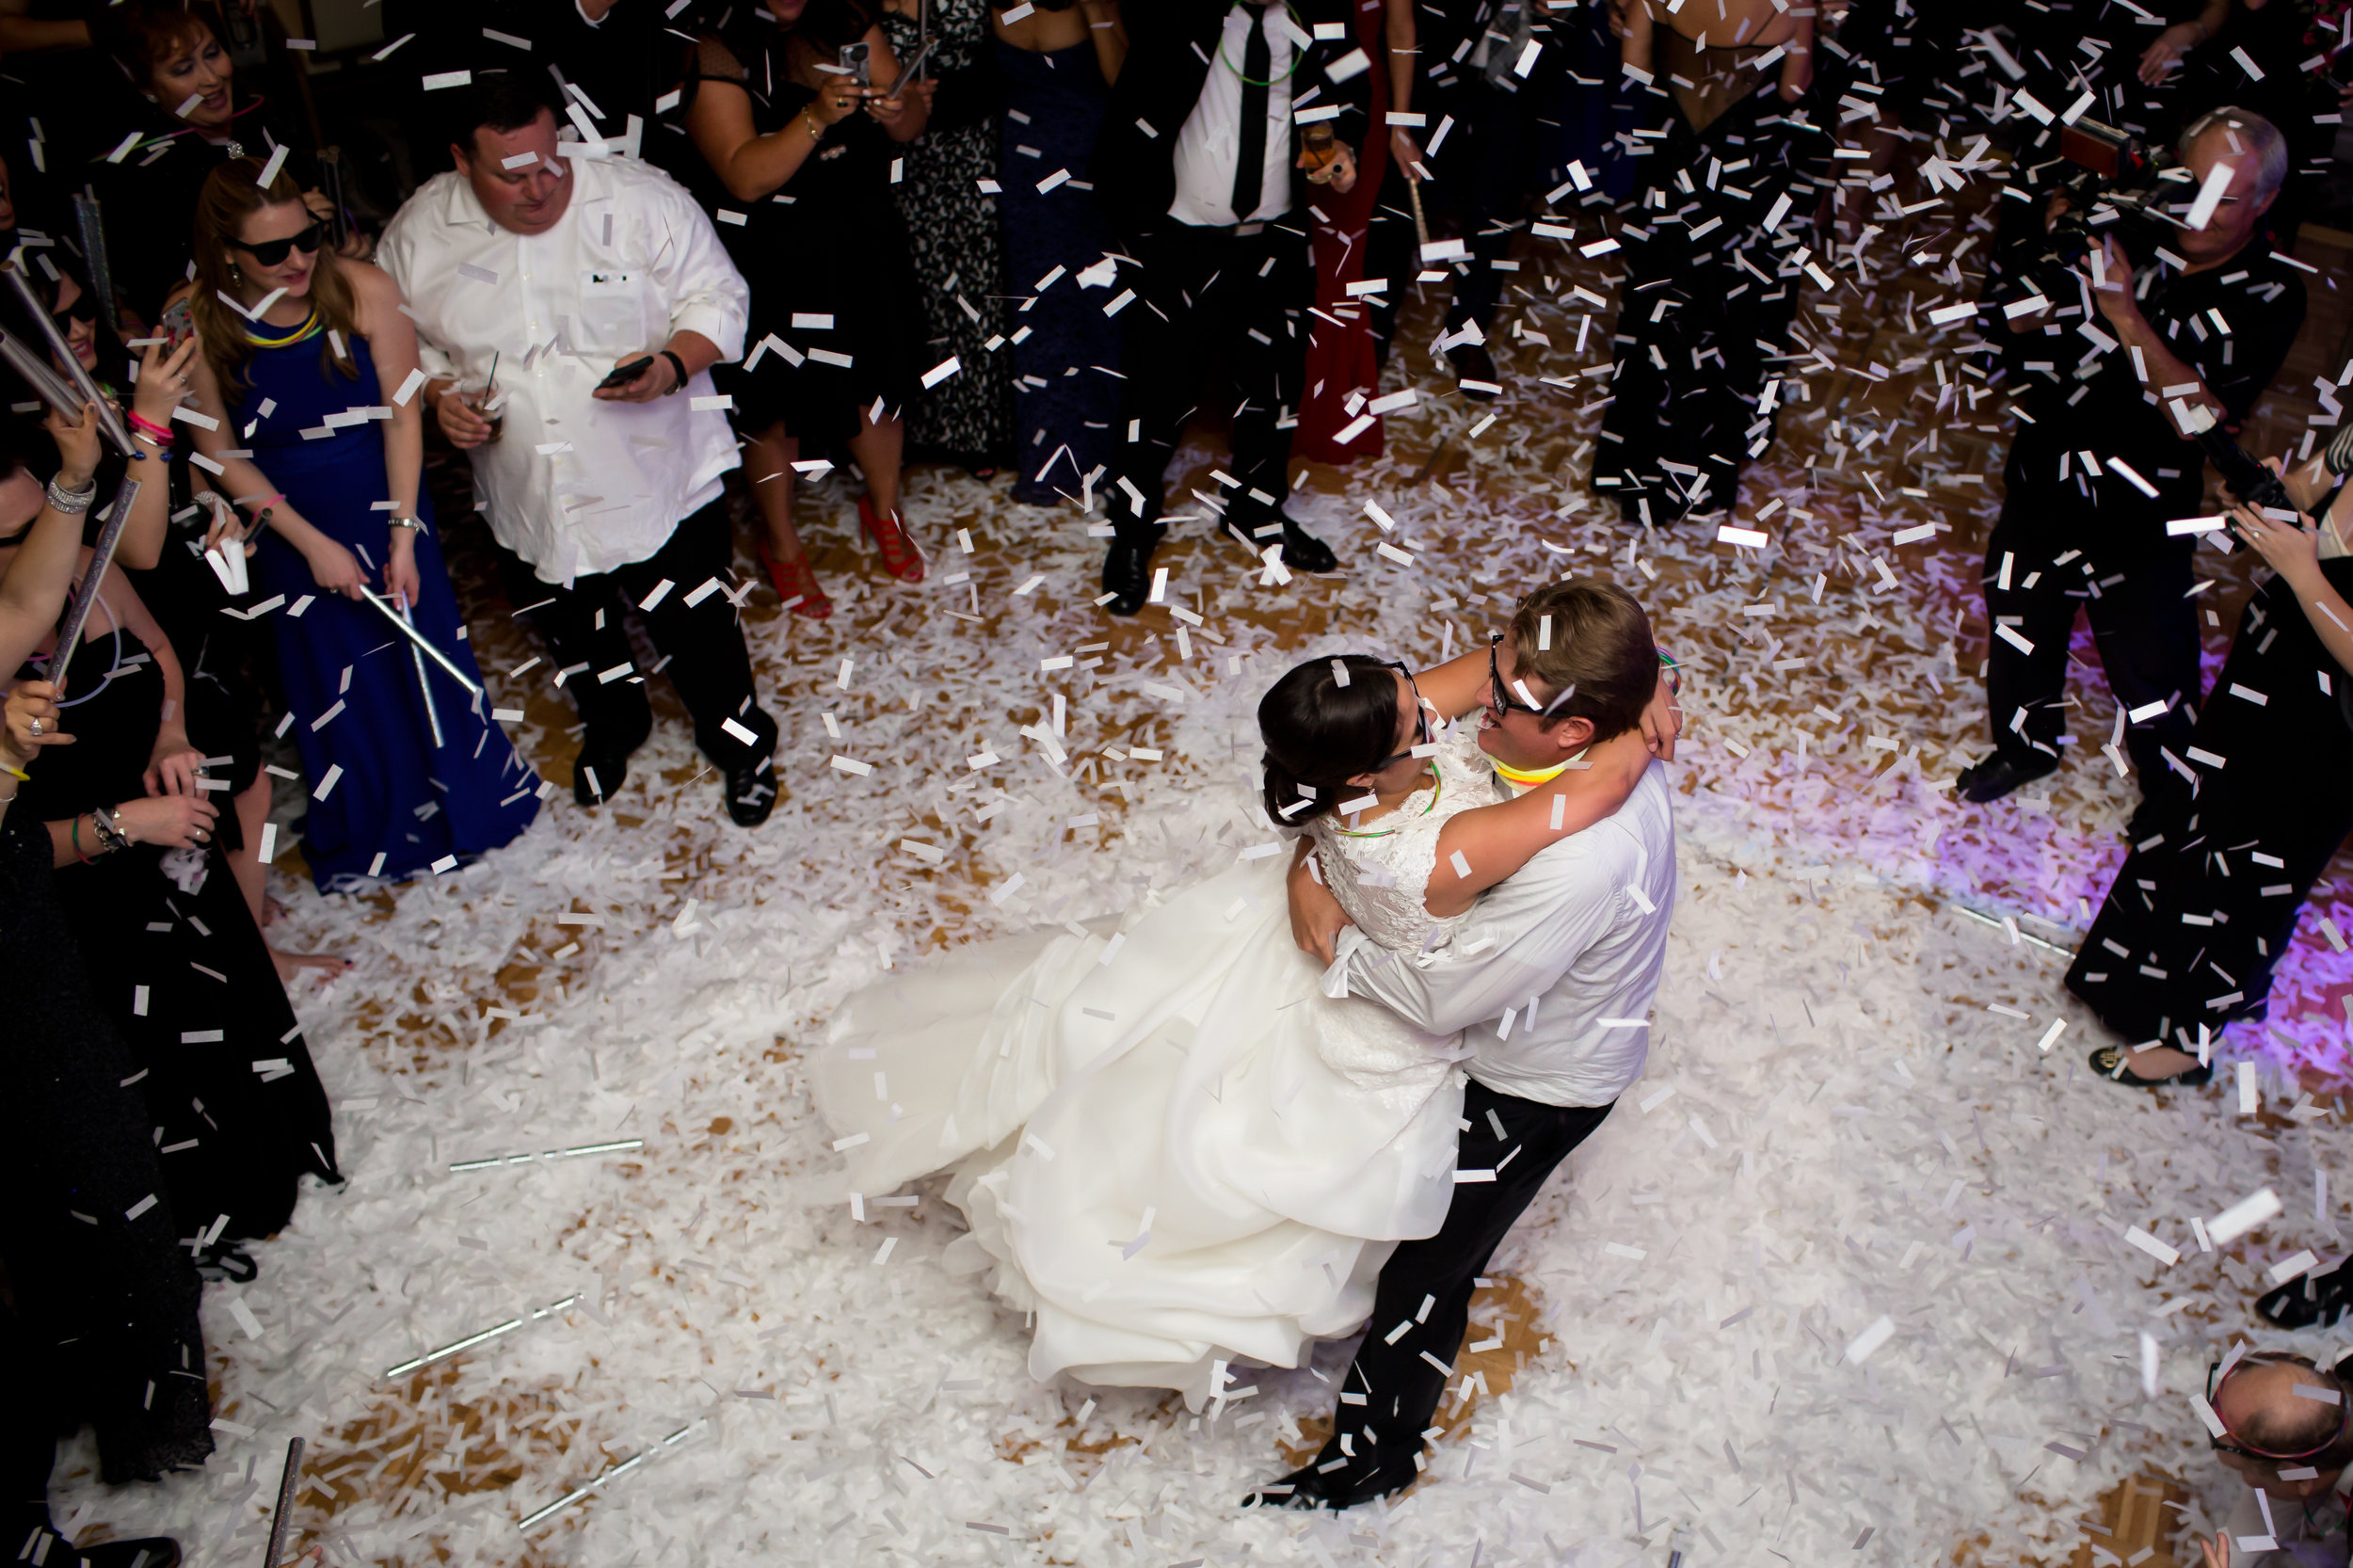 Marble_Falls_Horseshoe_Bay_Photographer_Torres_Wedding_35.jpg